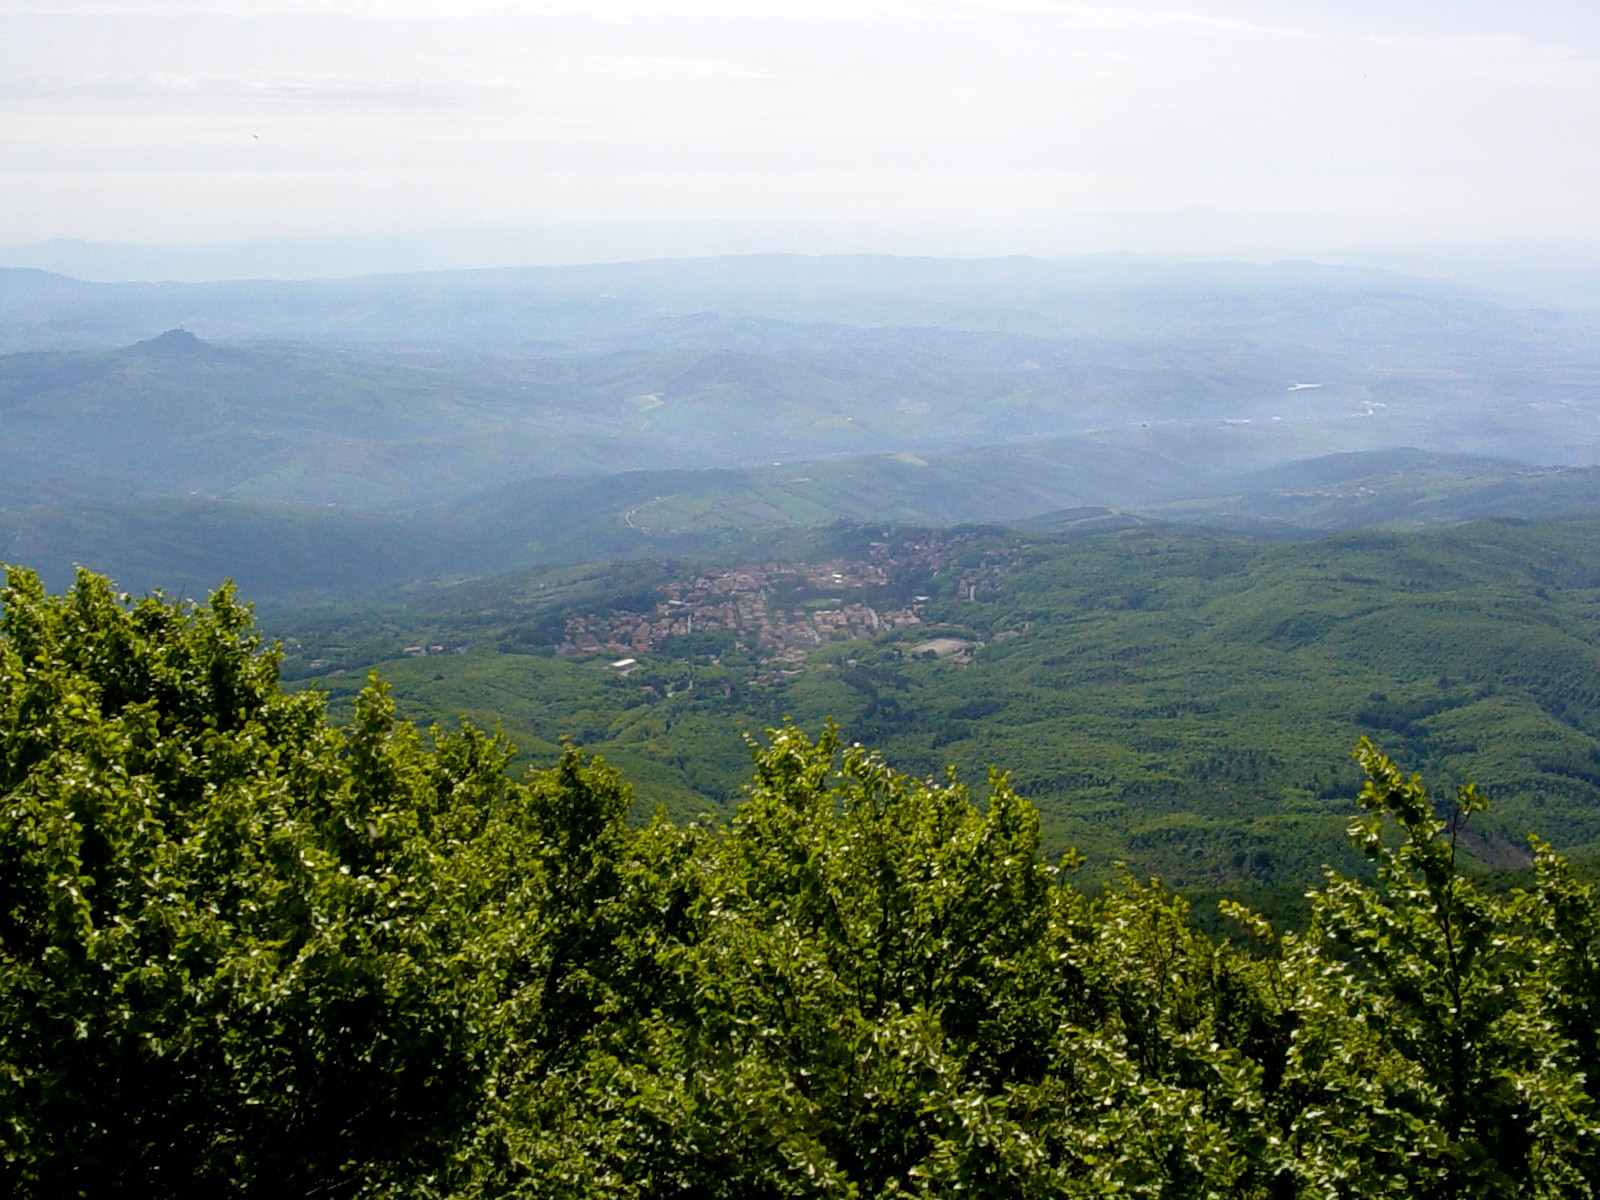 Foto: Manfred Karl / Mountainbike Tour / Monte Amiata, 1733 m / Gipfelschau / 20.06.2007 06:14:05